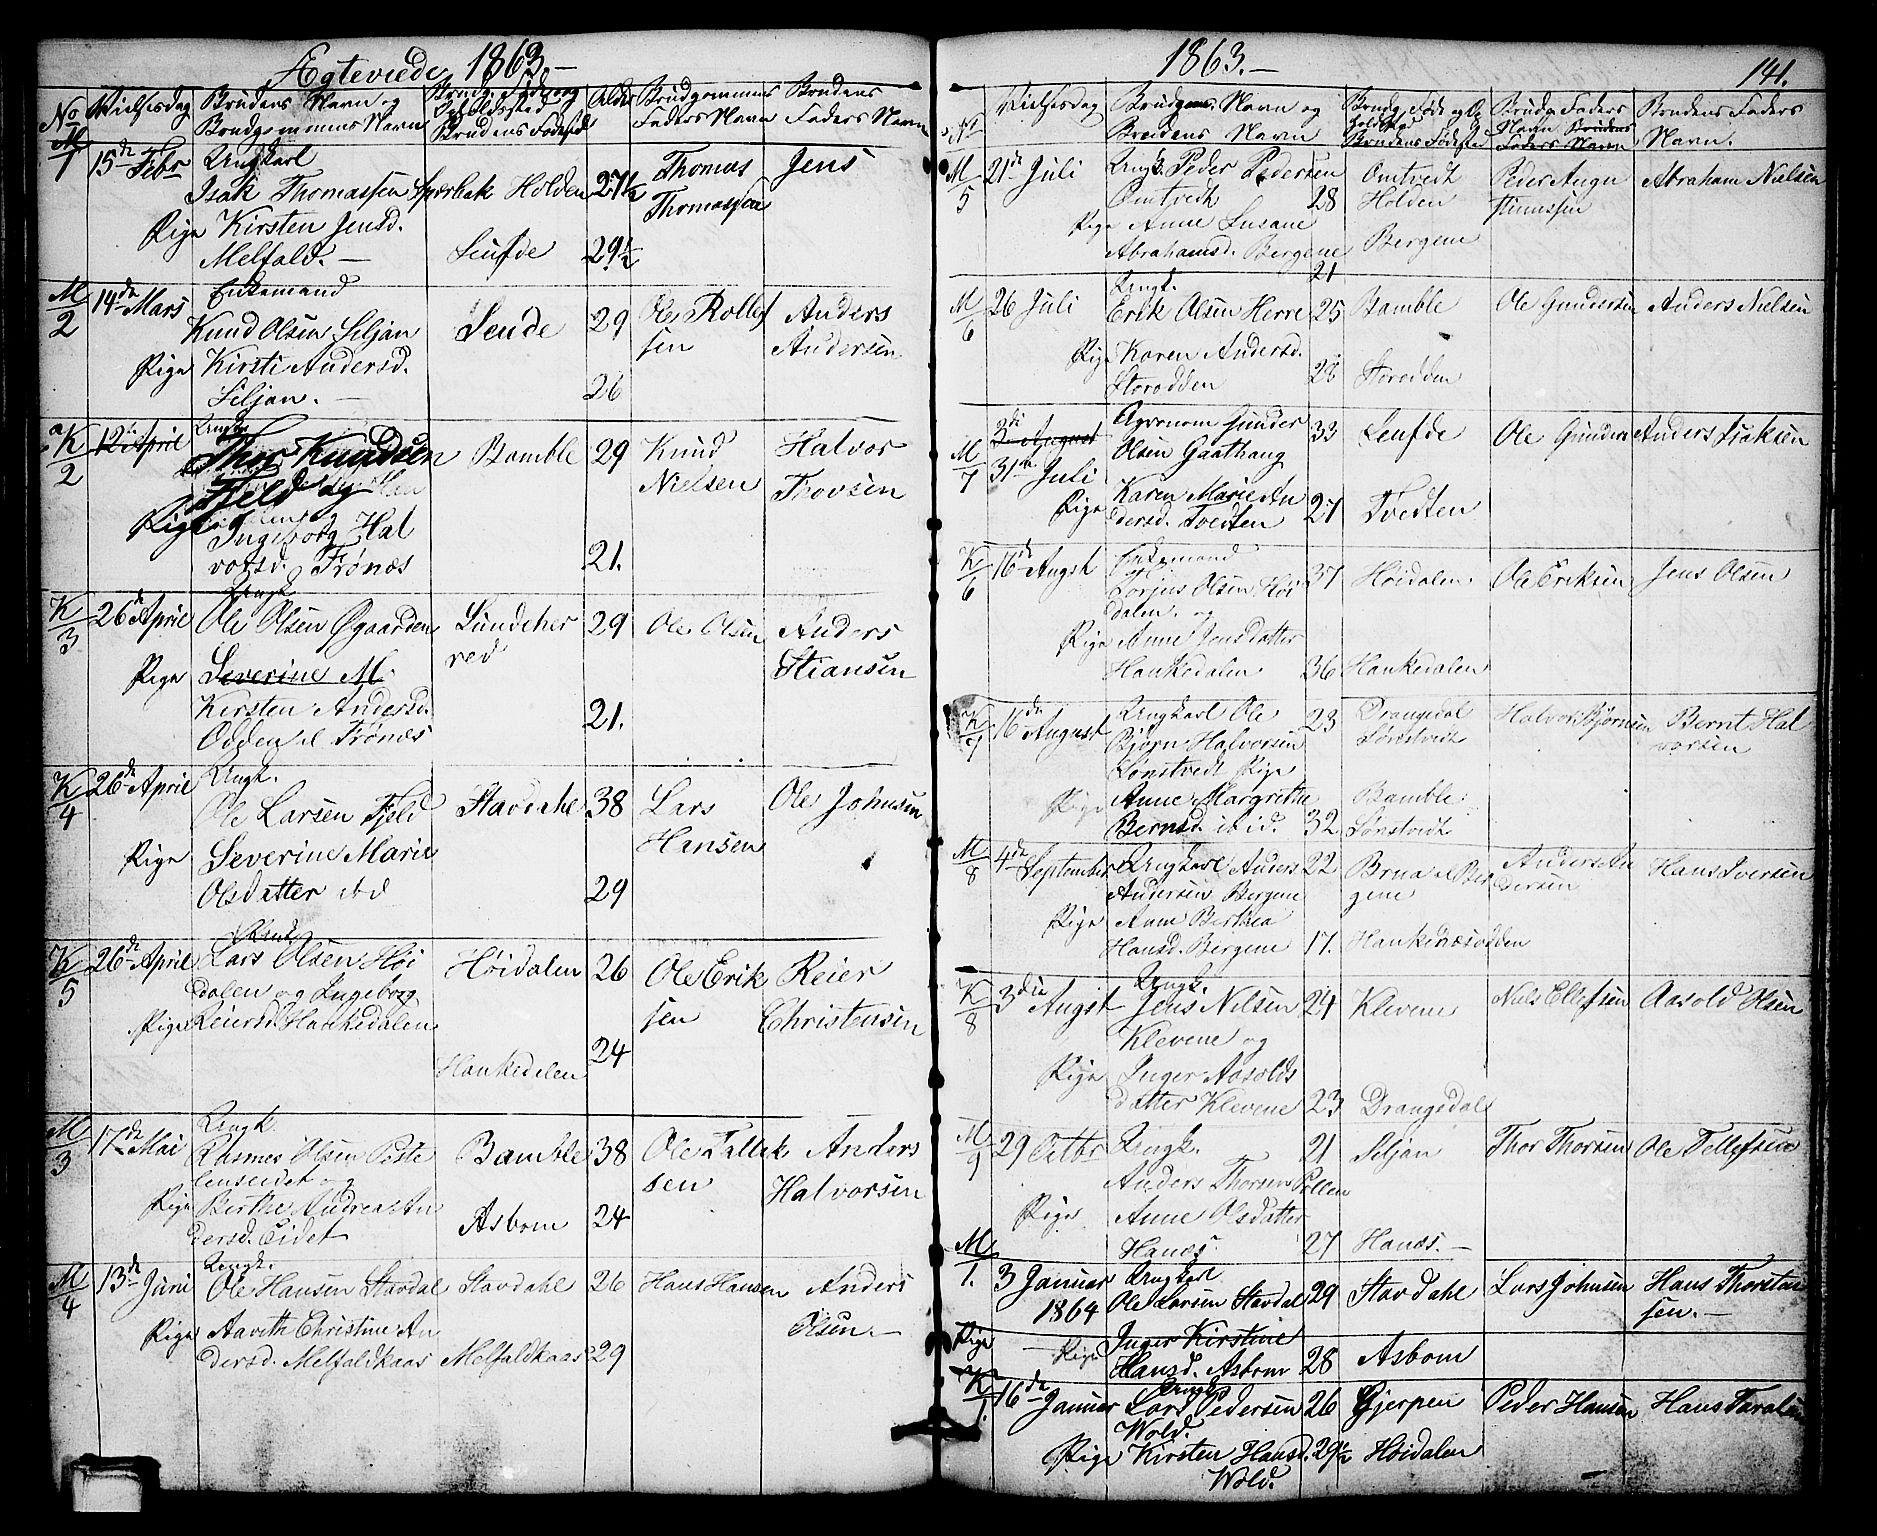 SAKO, Solum kirkebøker, G/Gb/L0002: Klokkerbok nr. II 2, 1859-1879, s. 141